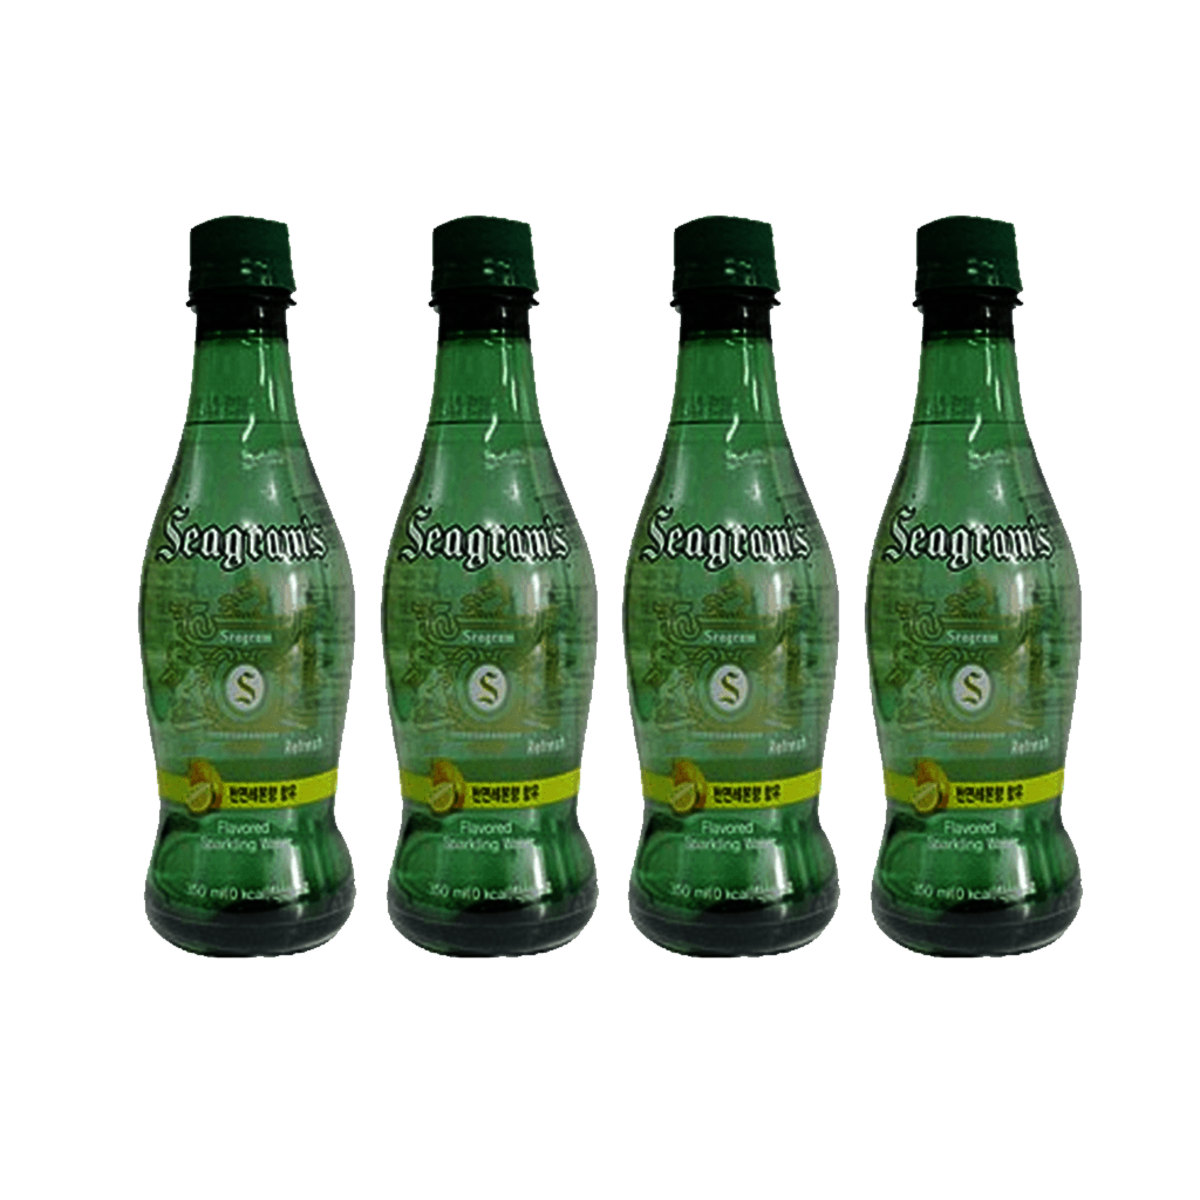 Seagram's bubble water Lemon flavor 350ml x 4